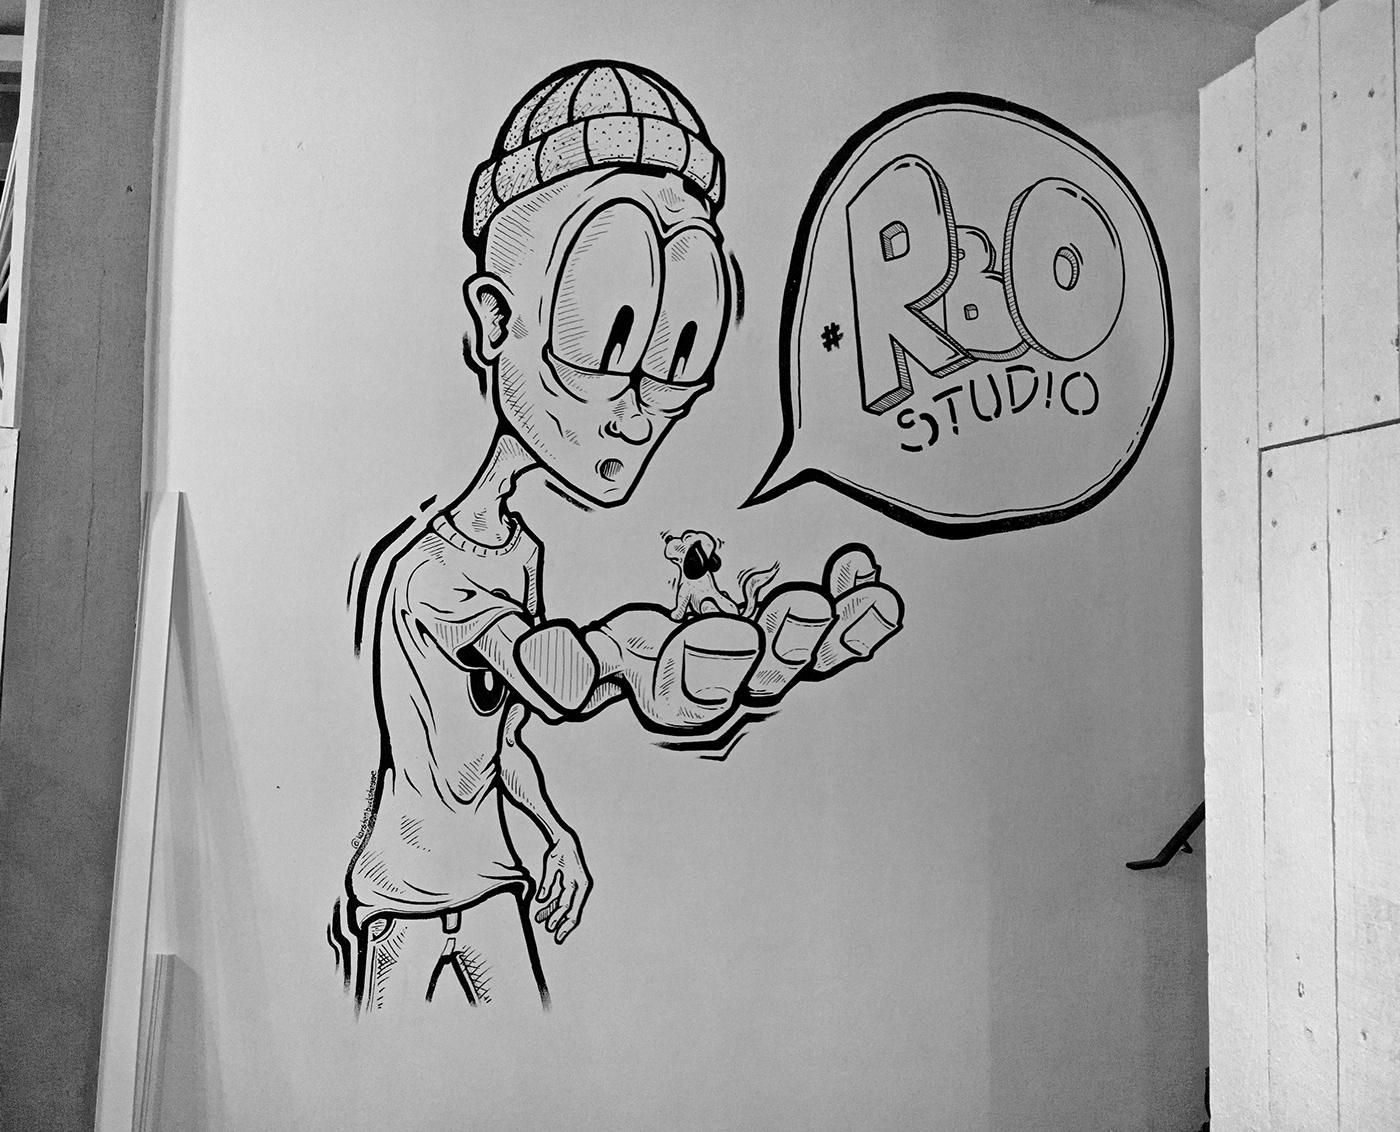 Mural wallart characterdesign streetart hamburg